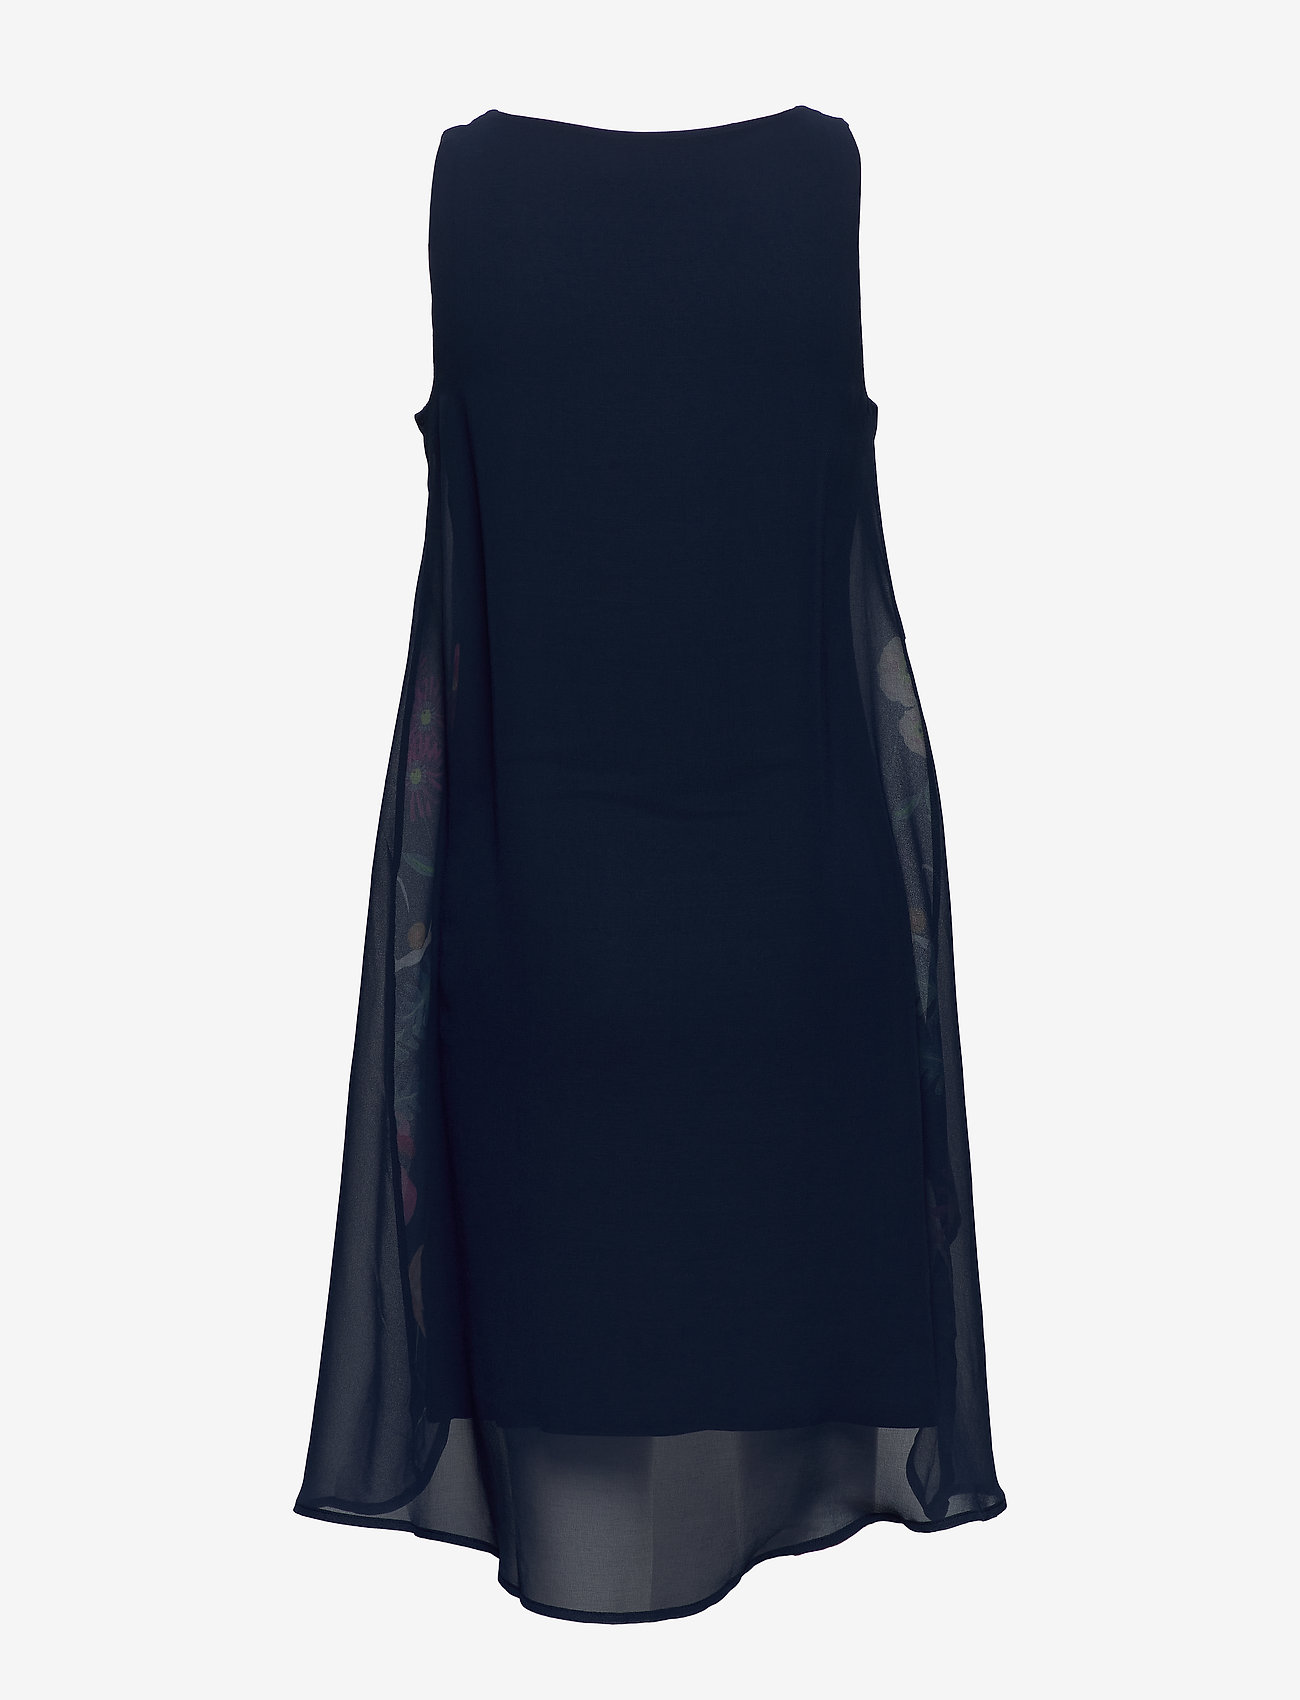 Desigual - VEST CARNEGIE - korte jurken - azul tinta - 1